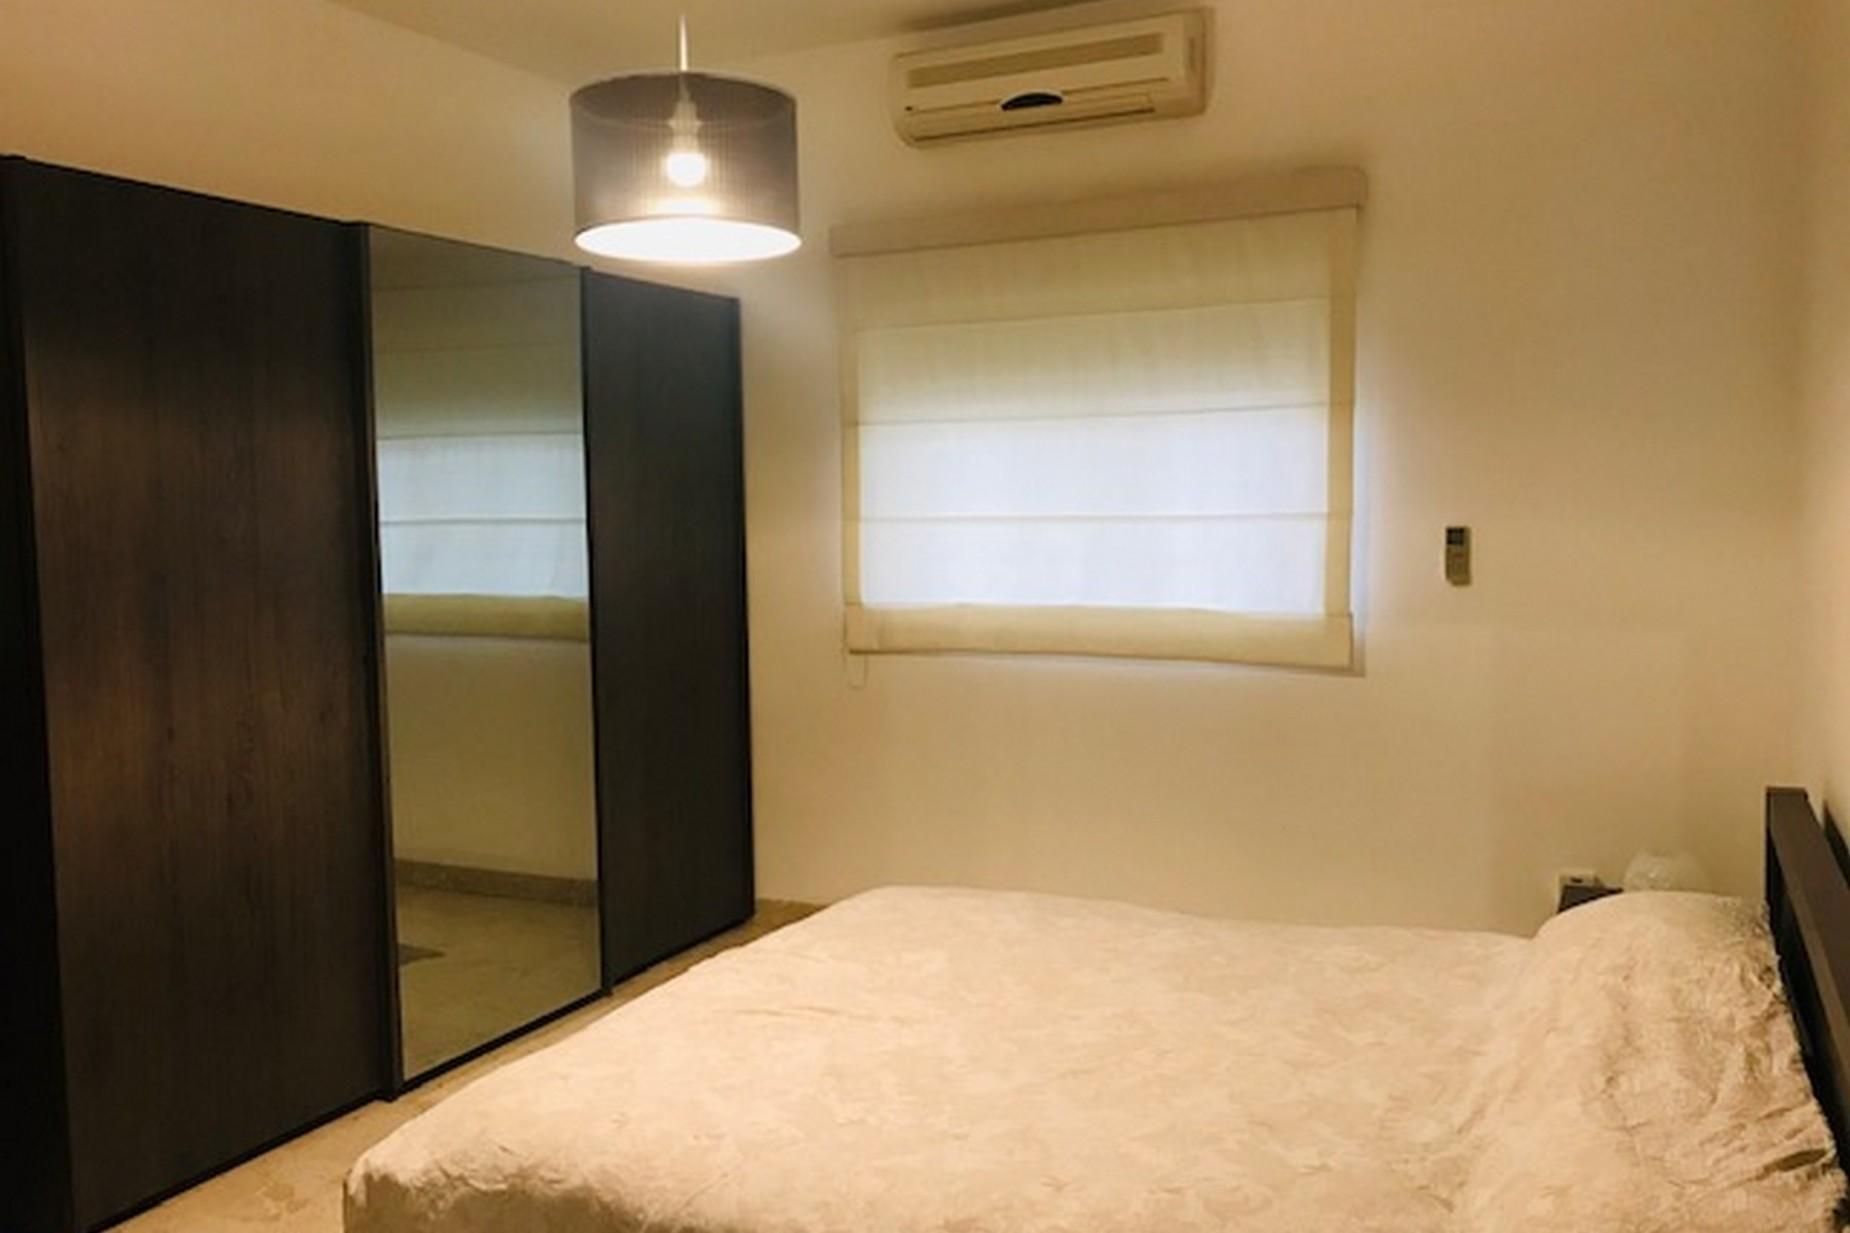 4 bed Apartment For Rent in Sliema, Sliema - thumb 7